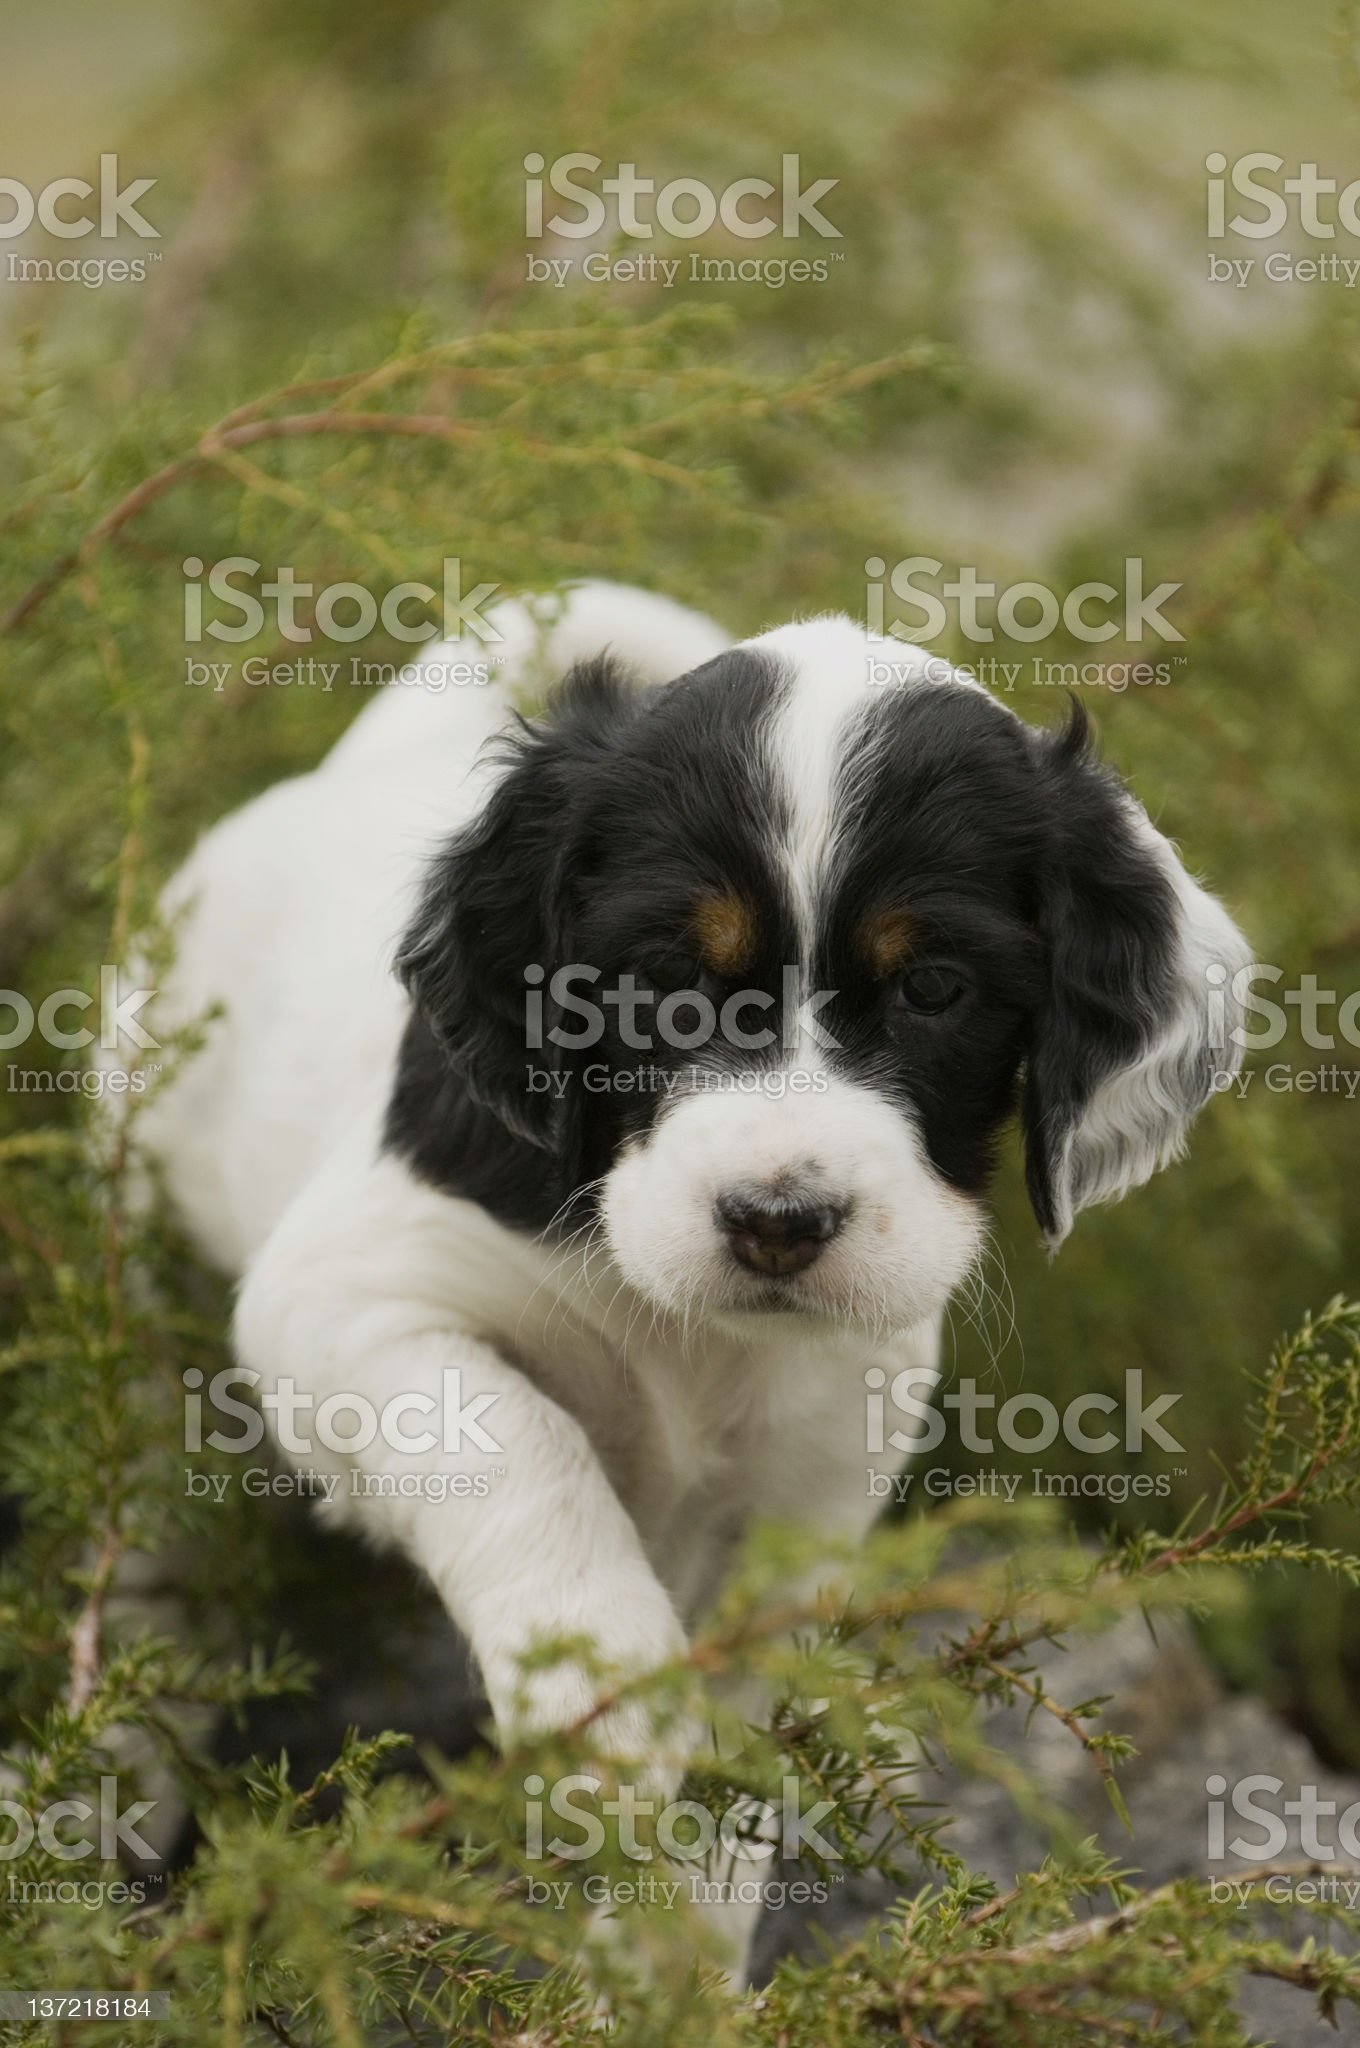 English setter puppy royalty-free stock photo